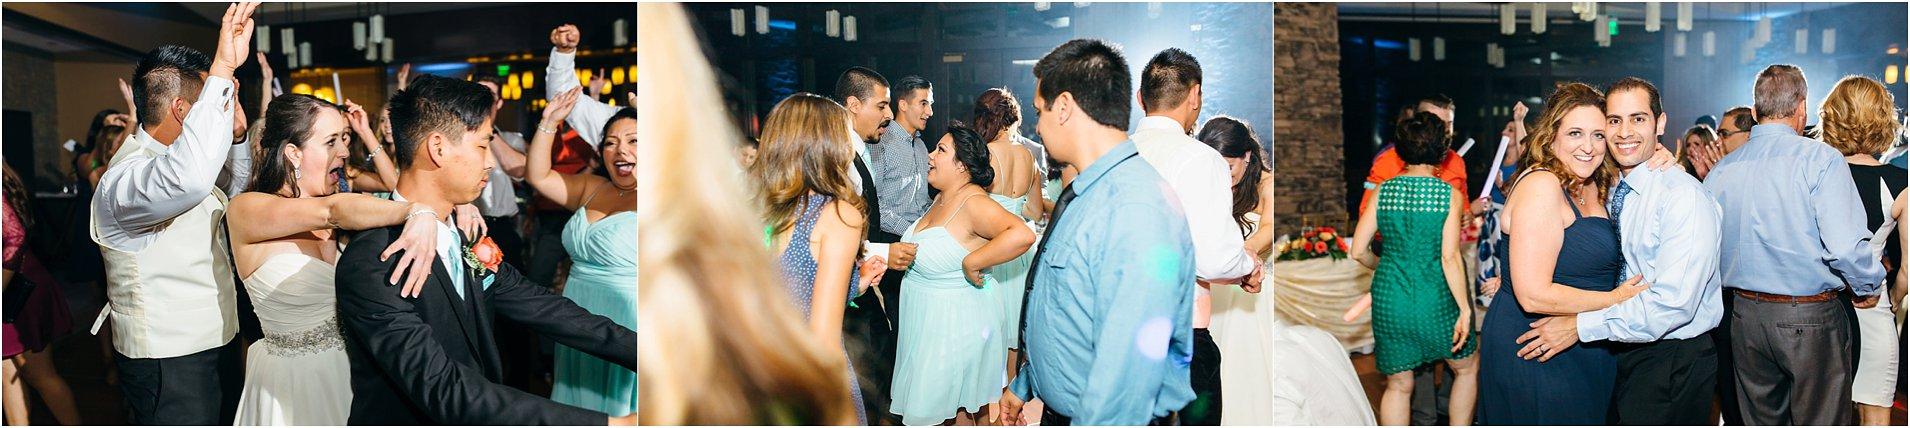 temecula wedding photographer, fun wedding reception